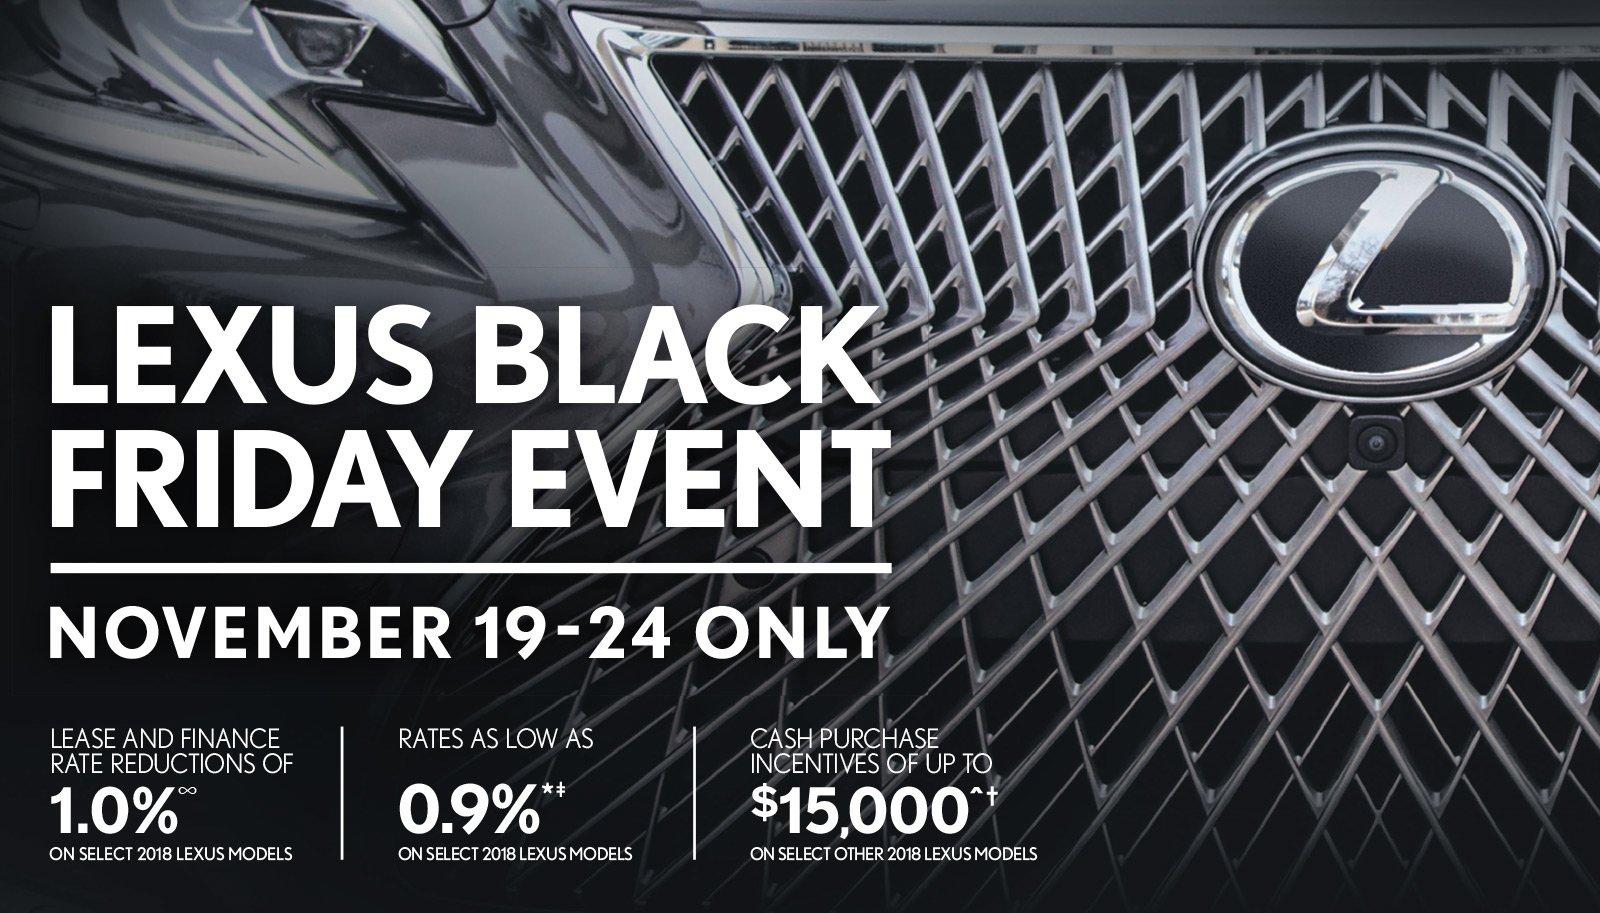 Lexus Black Friday Event at Lexus of Lakeridge